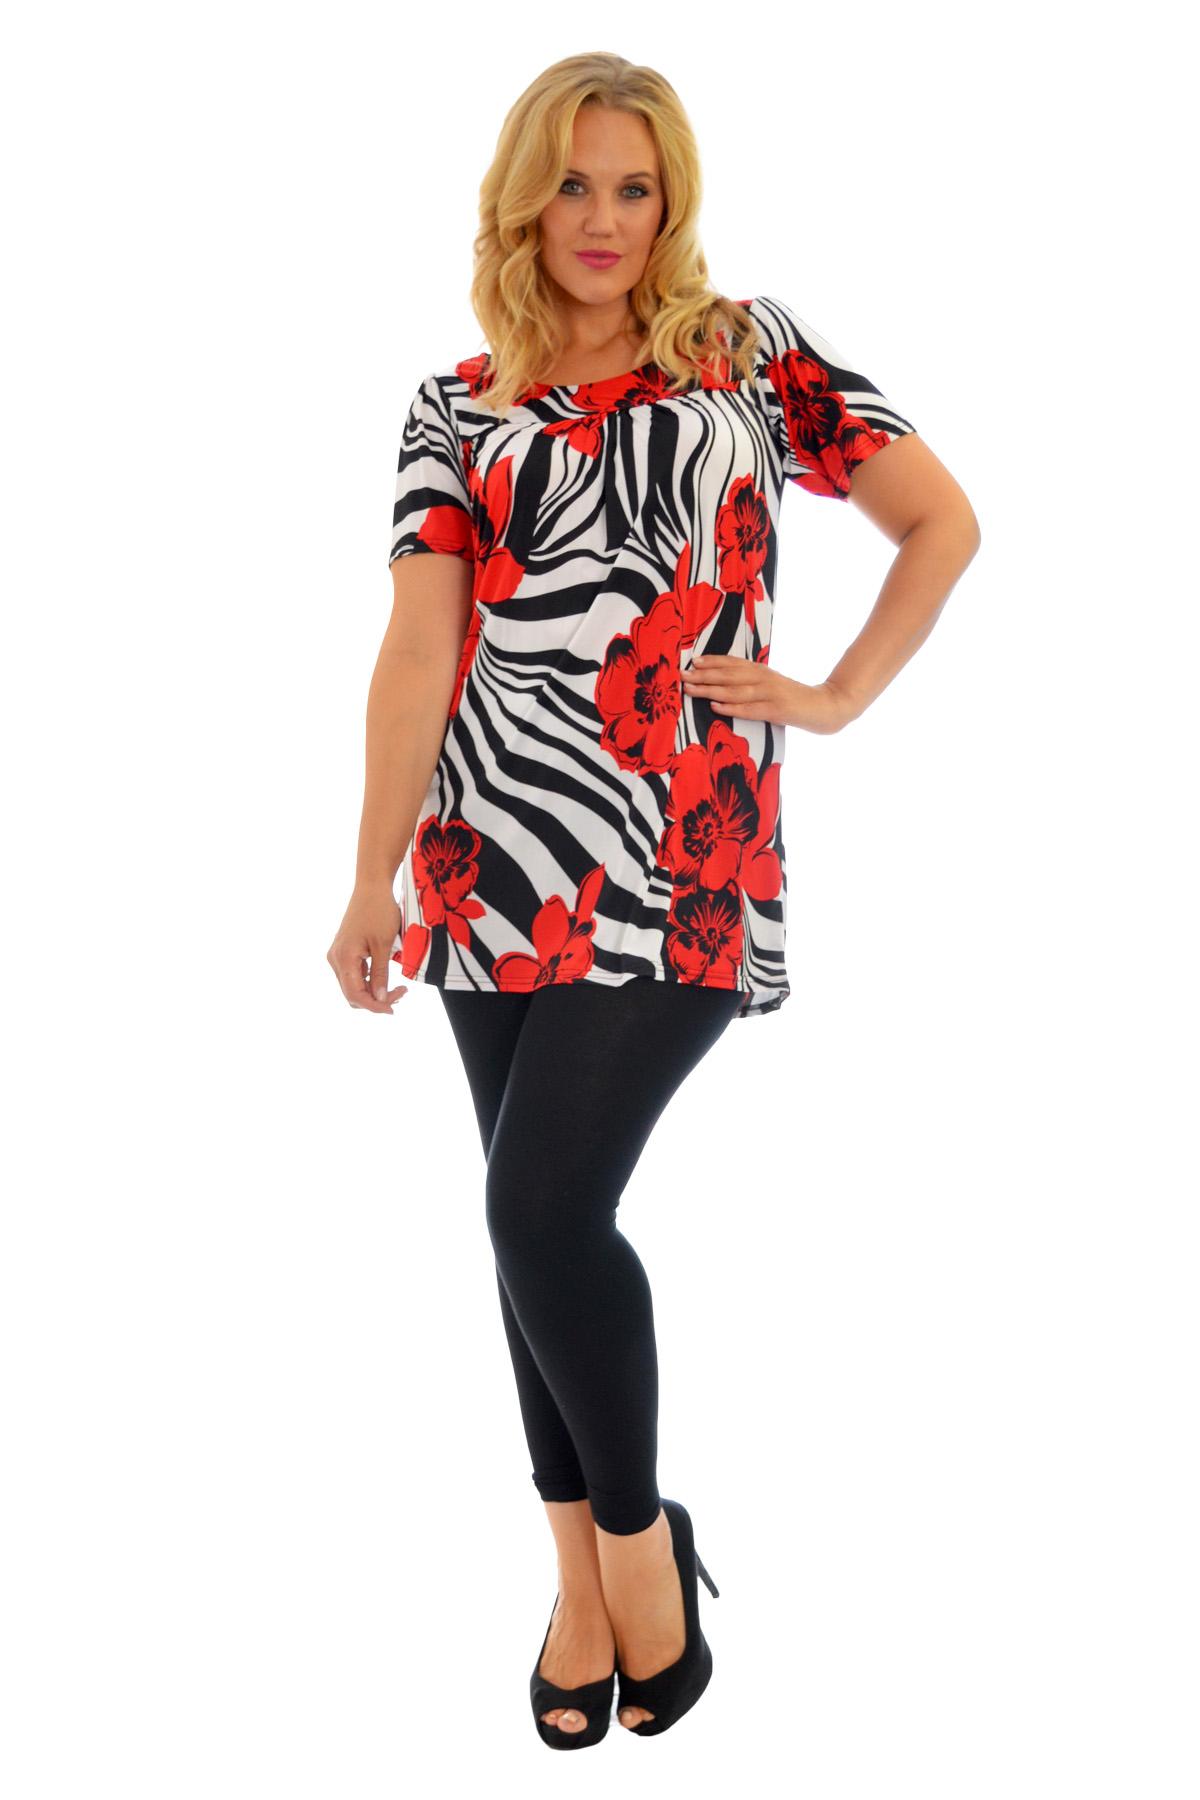 Womens Top Floral Print Ladies Tunic Short Sleeve Smock Shirt Plus Size Nouvelle